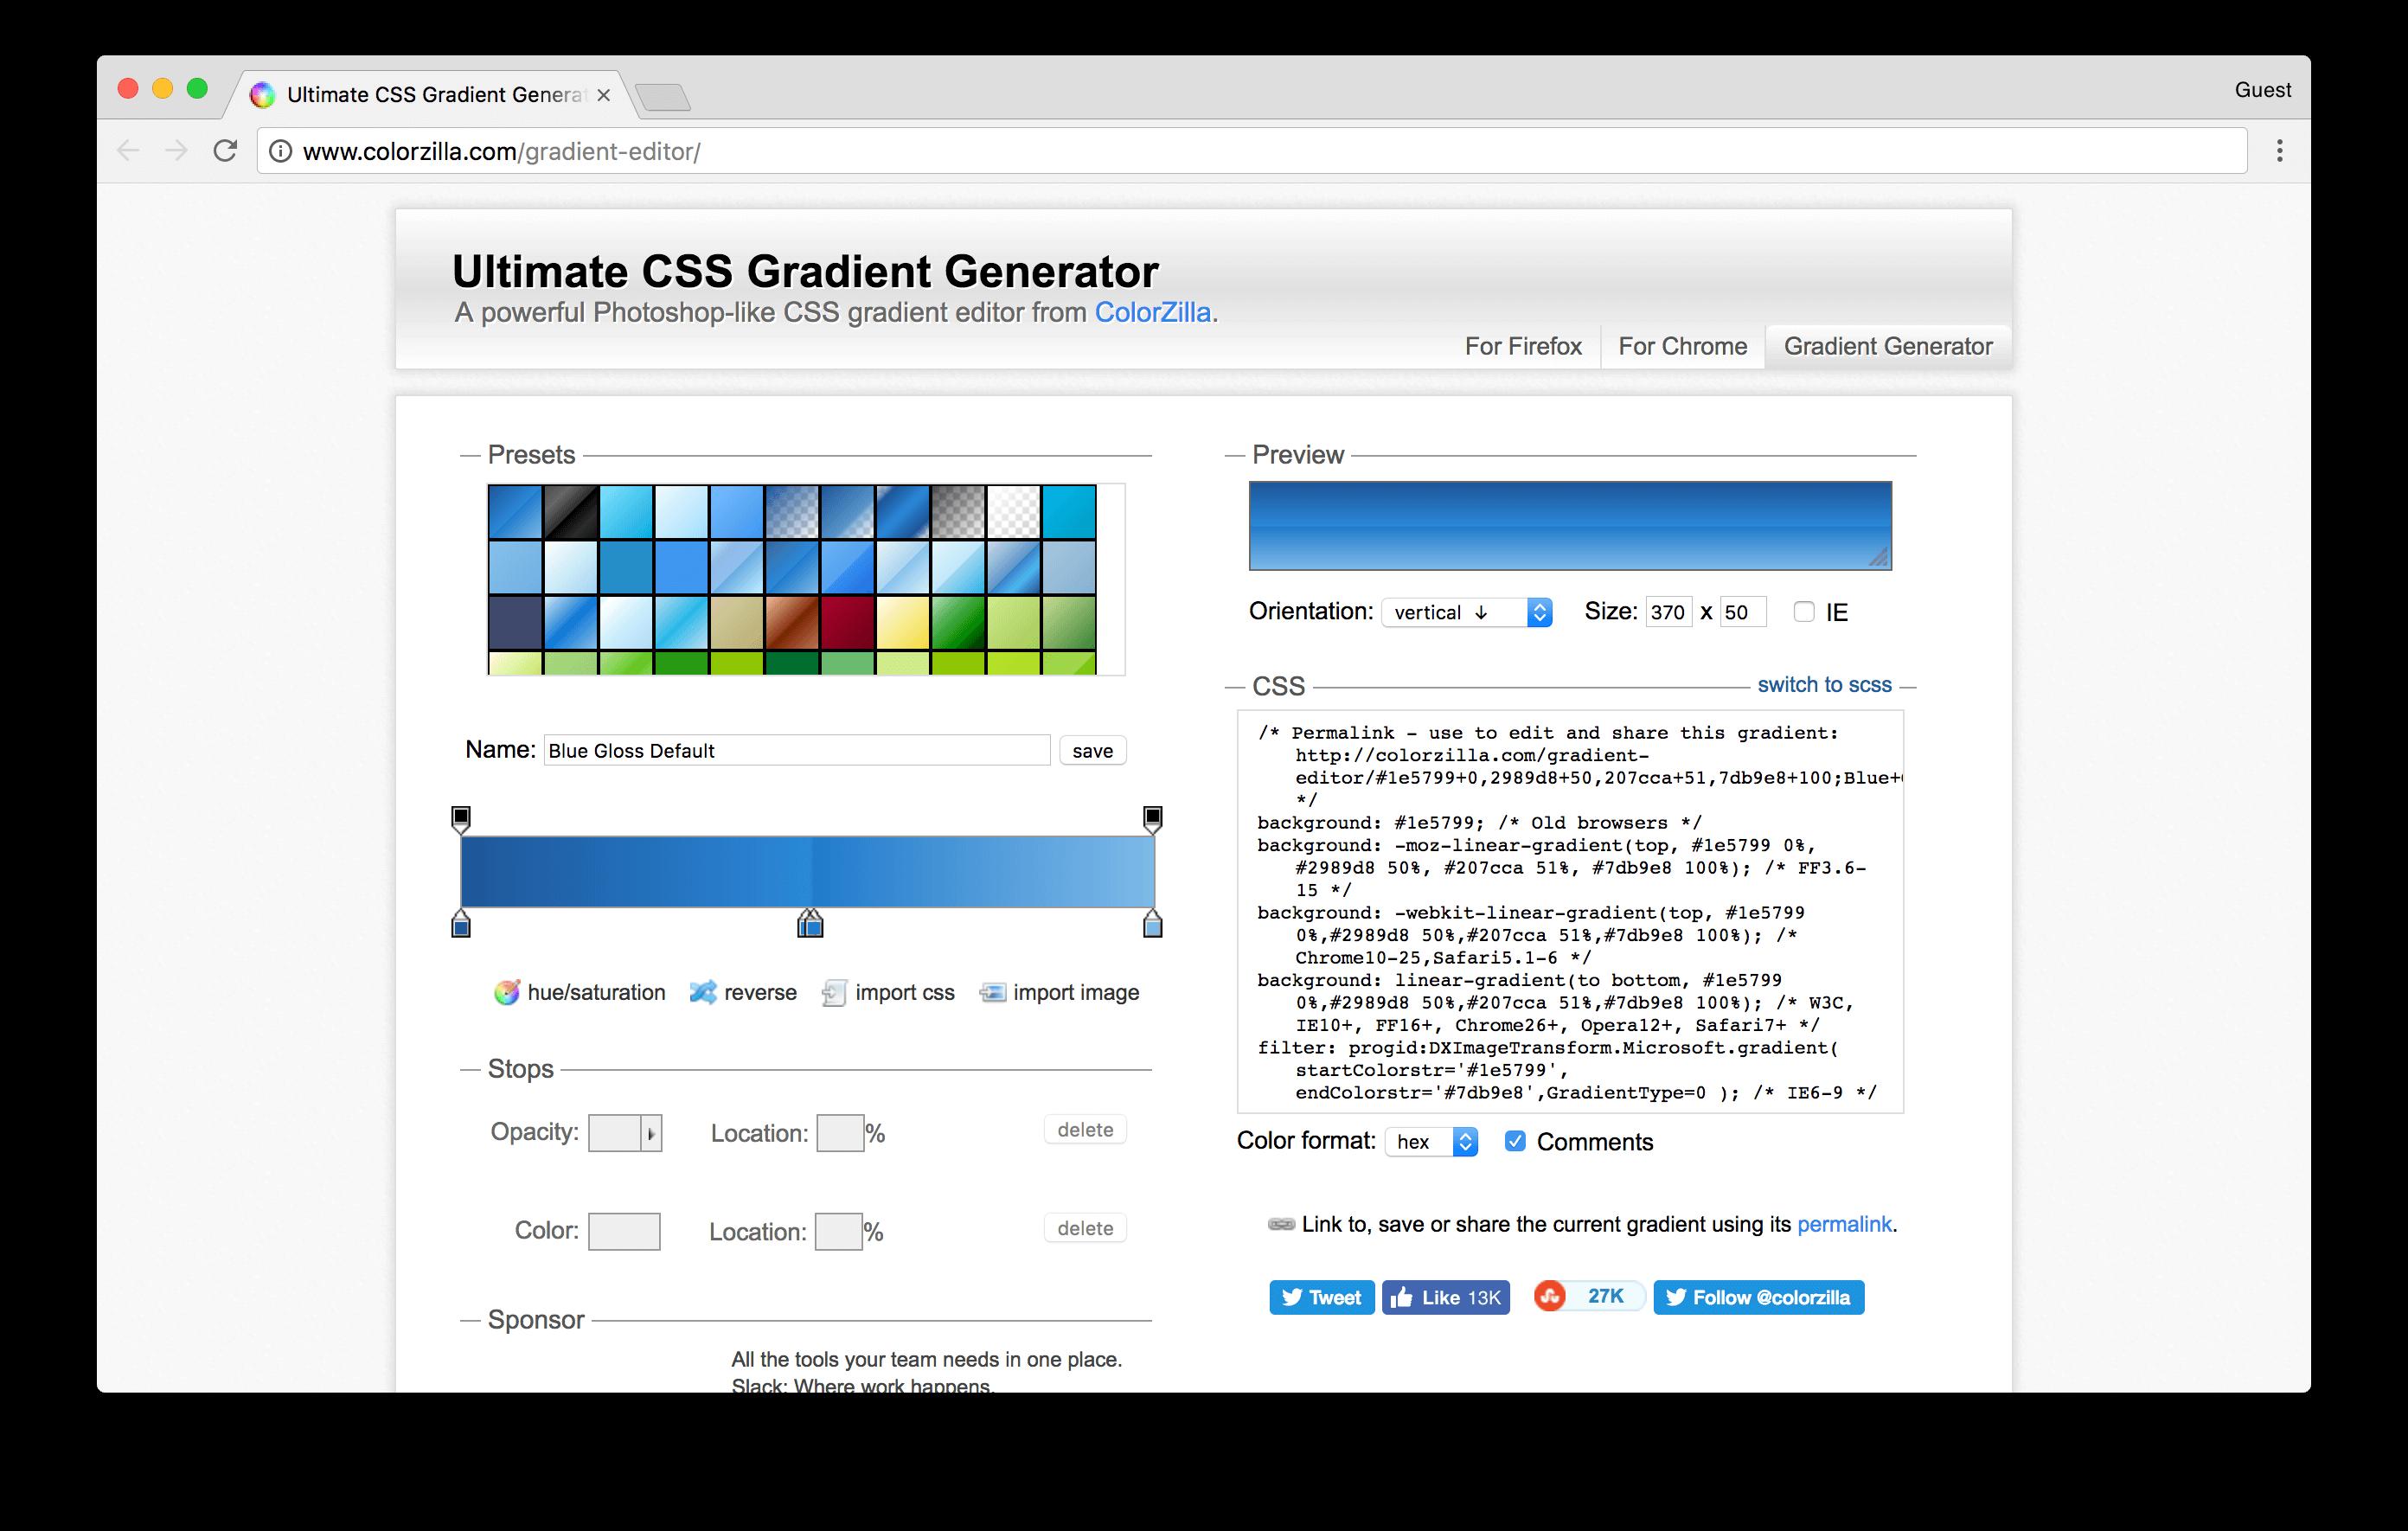 colorzilla.com/gradient-editor